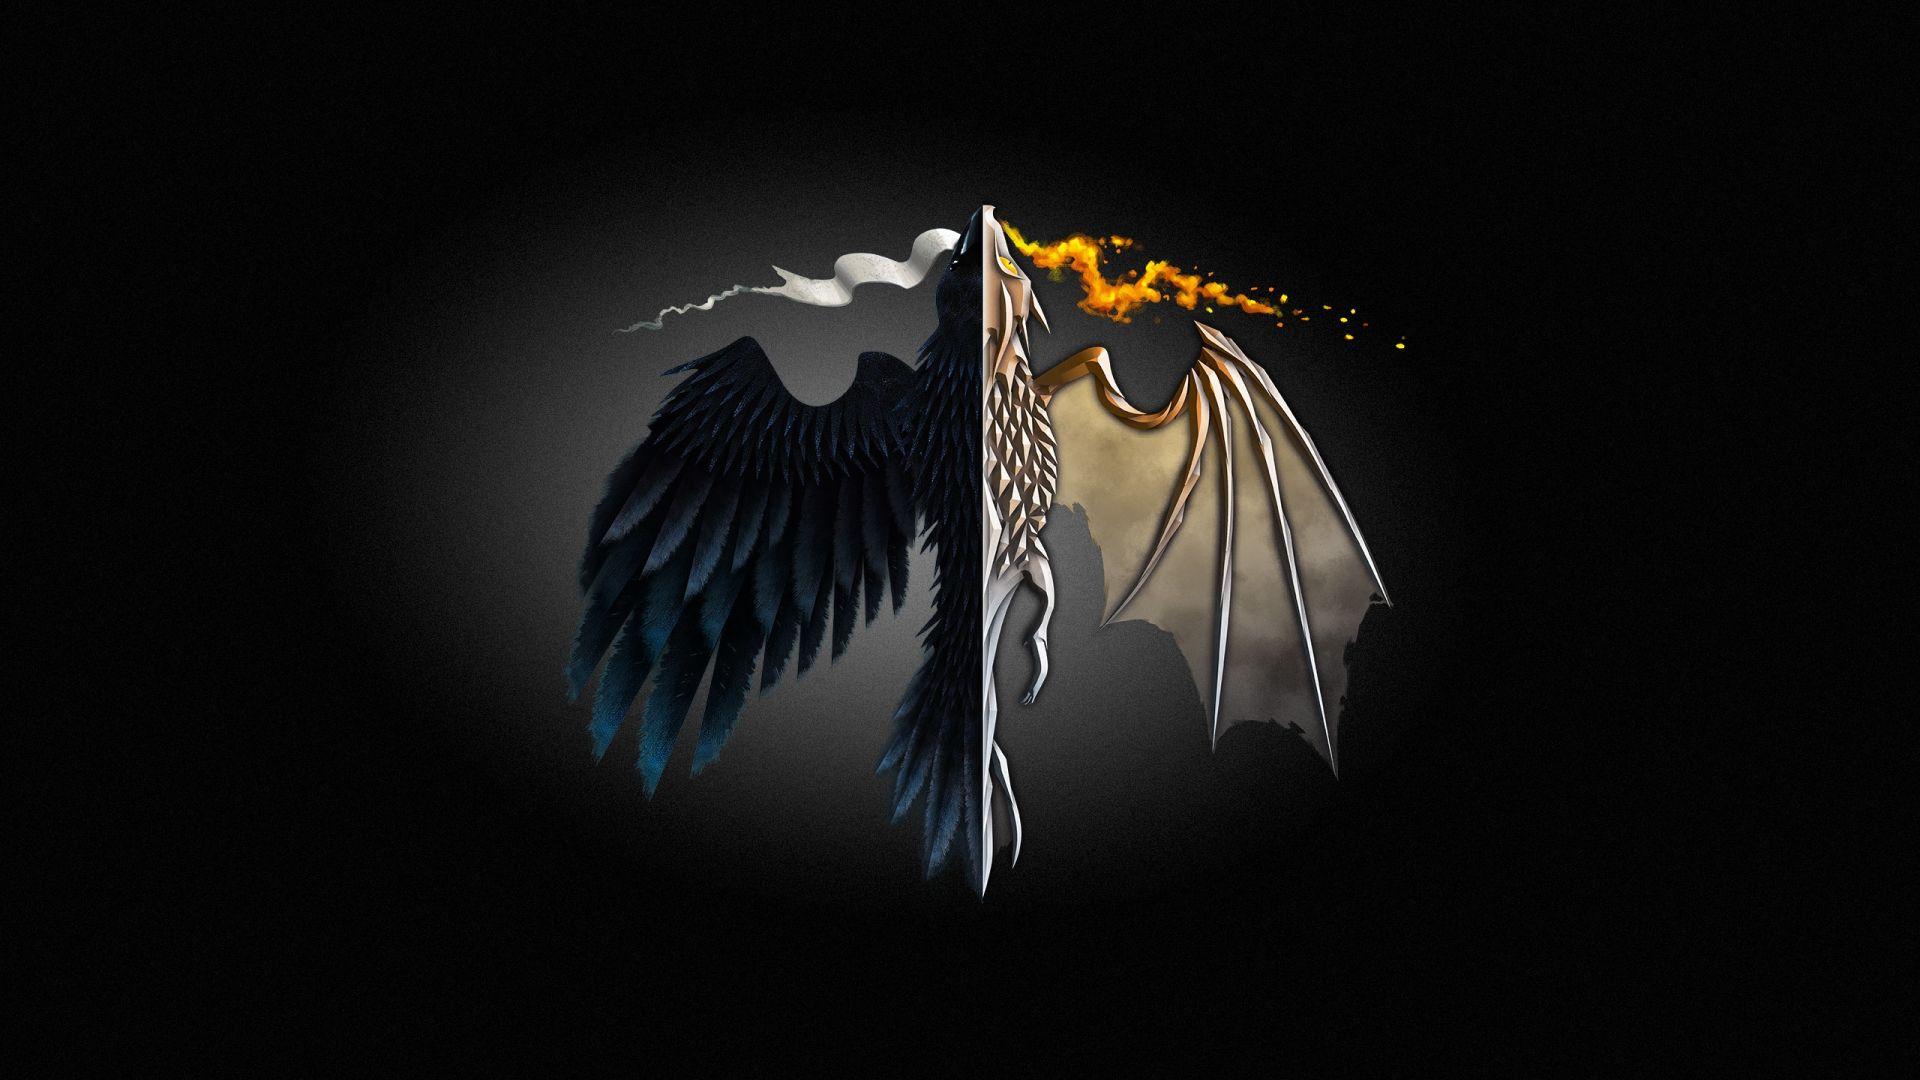 Game of Thrones Dragons minimalist art